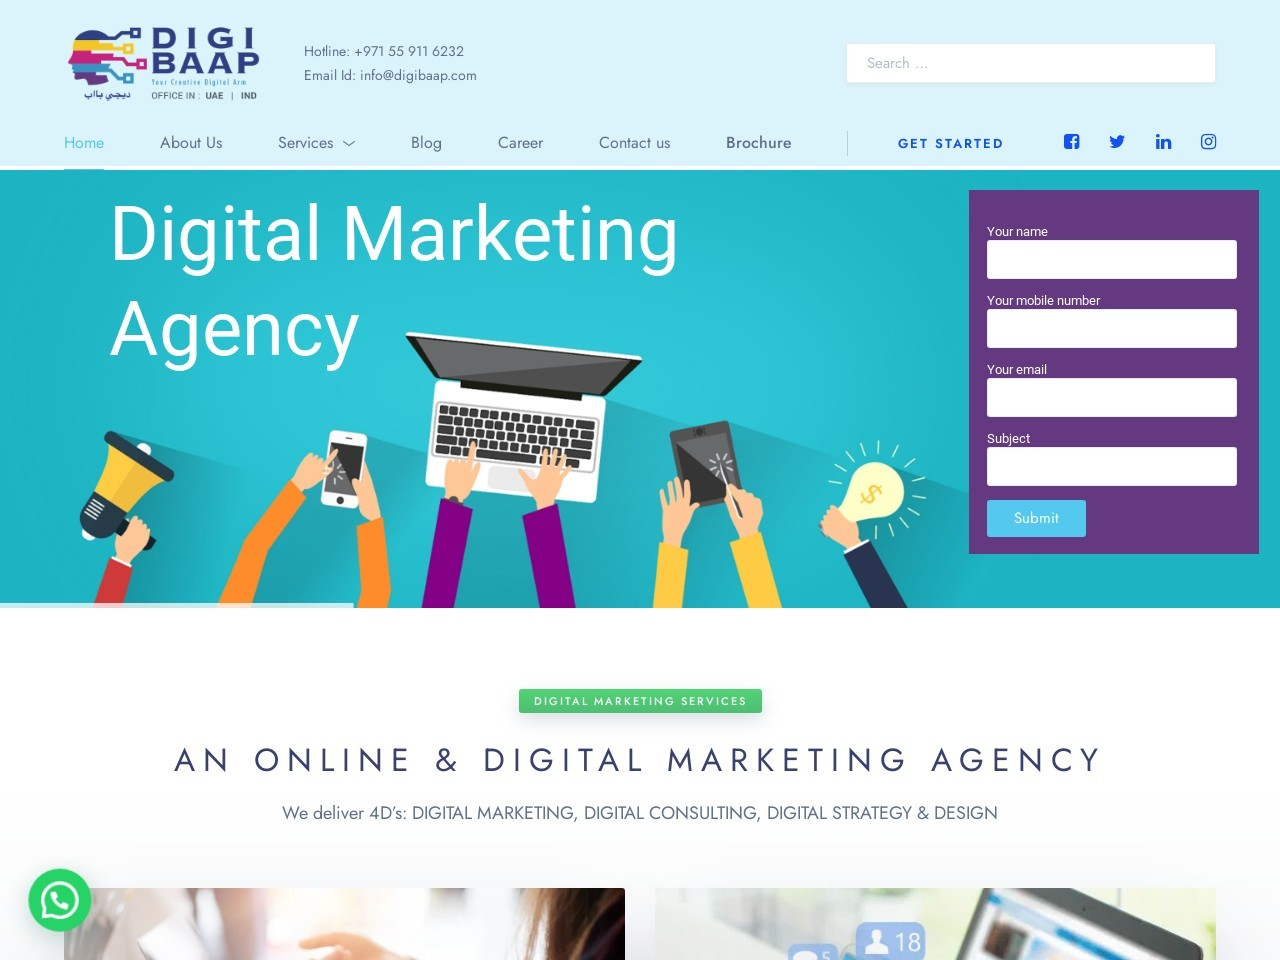 Digital Marketing Company in Bangalore, Dubai | Digibaap